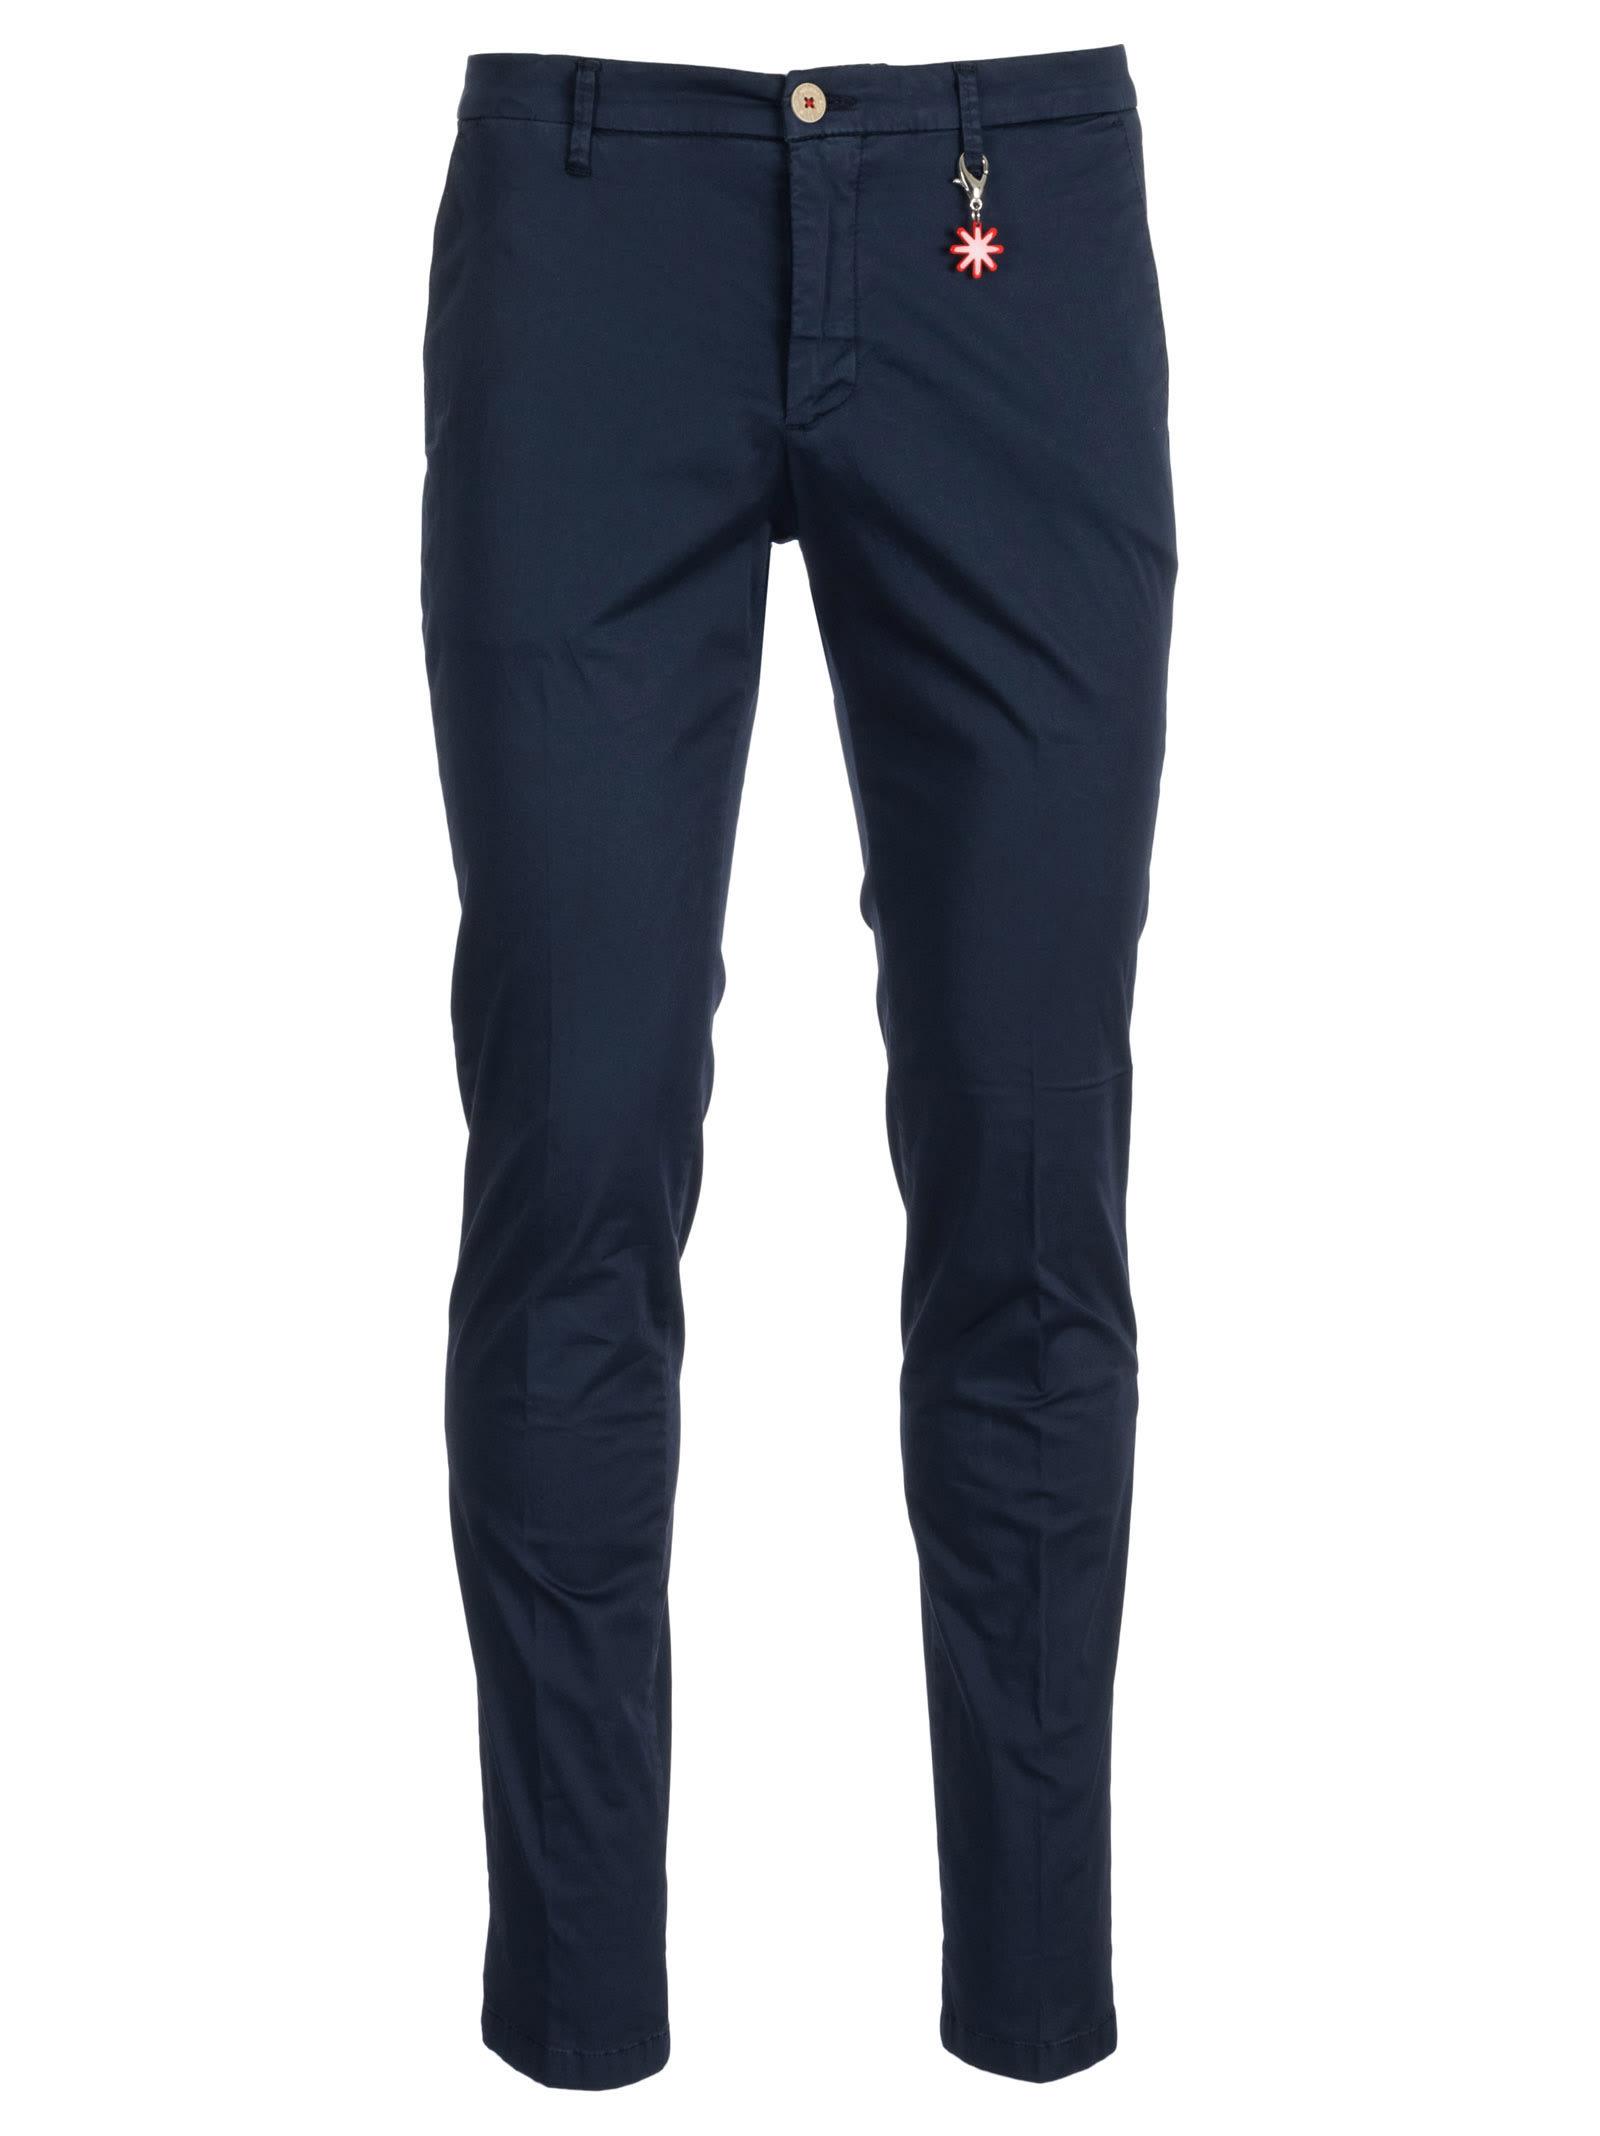 super popular 2bddd 5fcc9 Manuel Ritz Slim Trousers